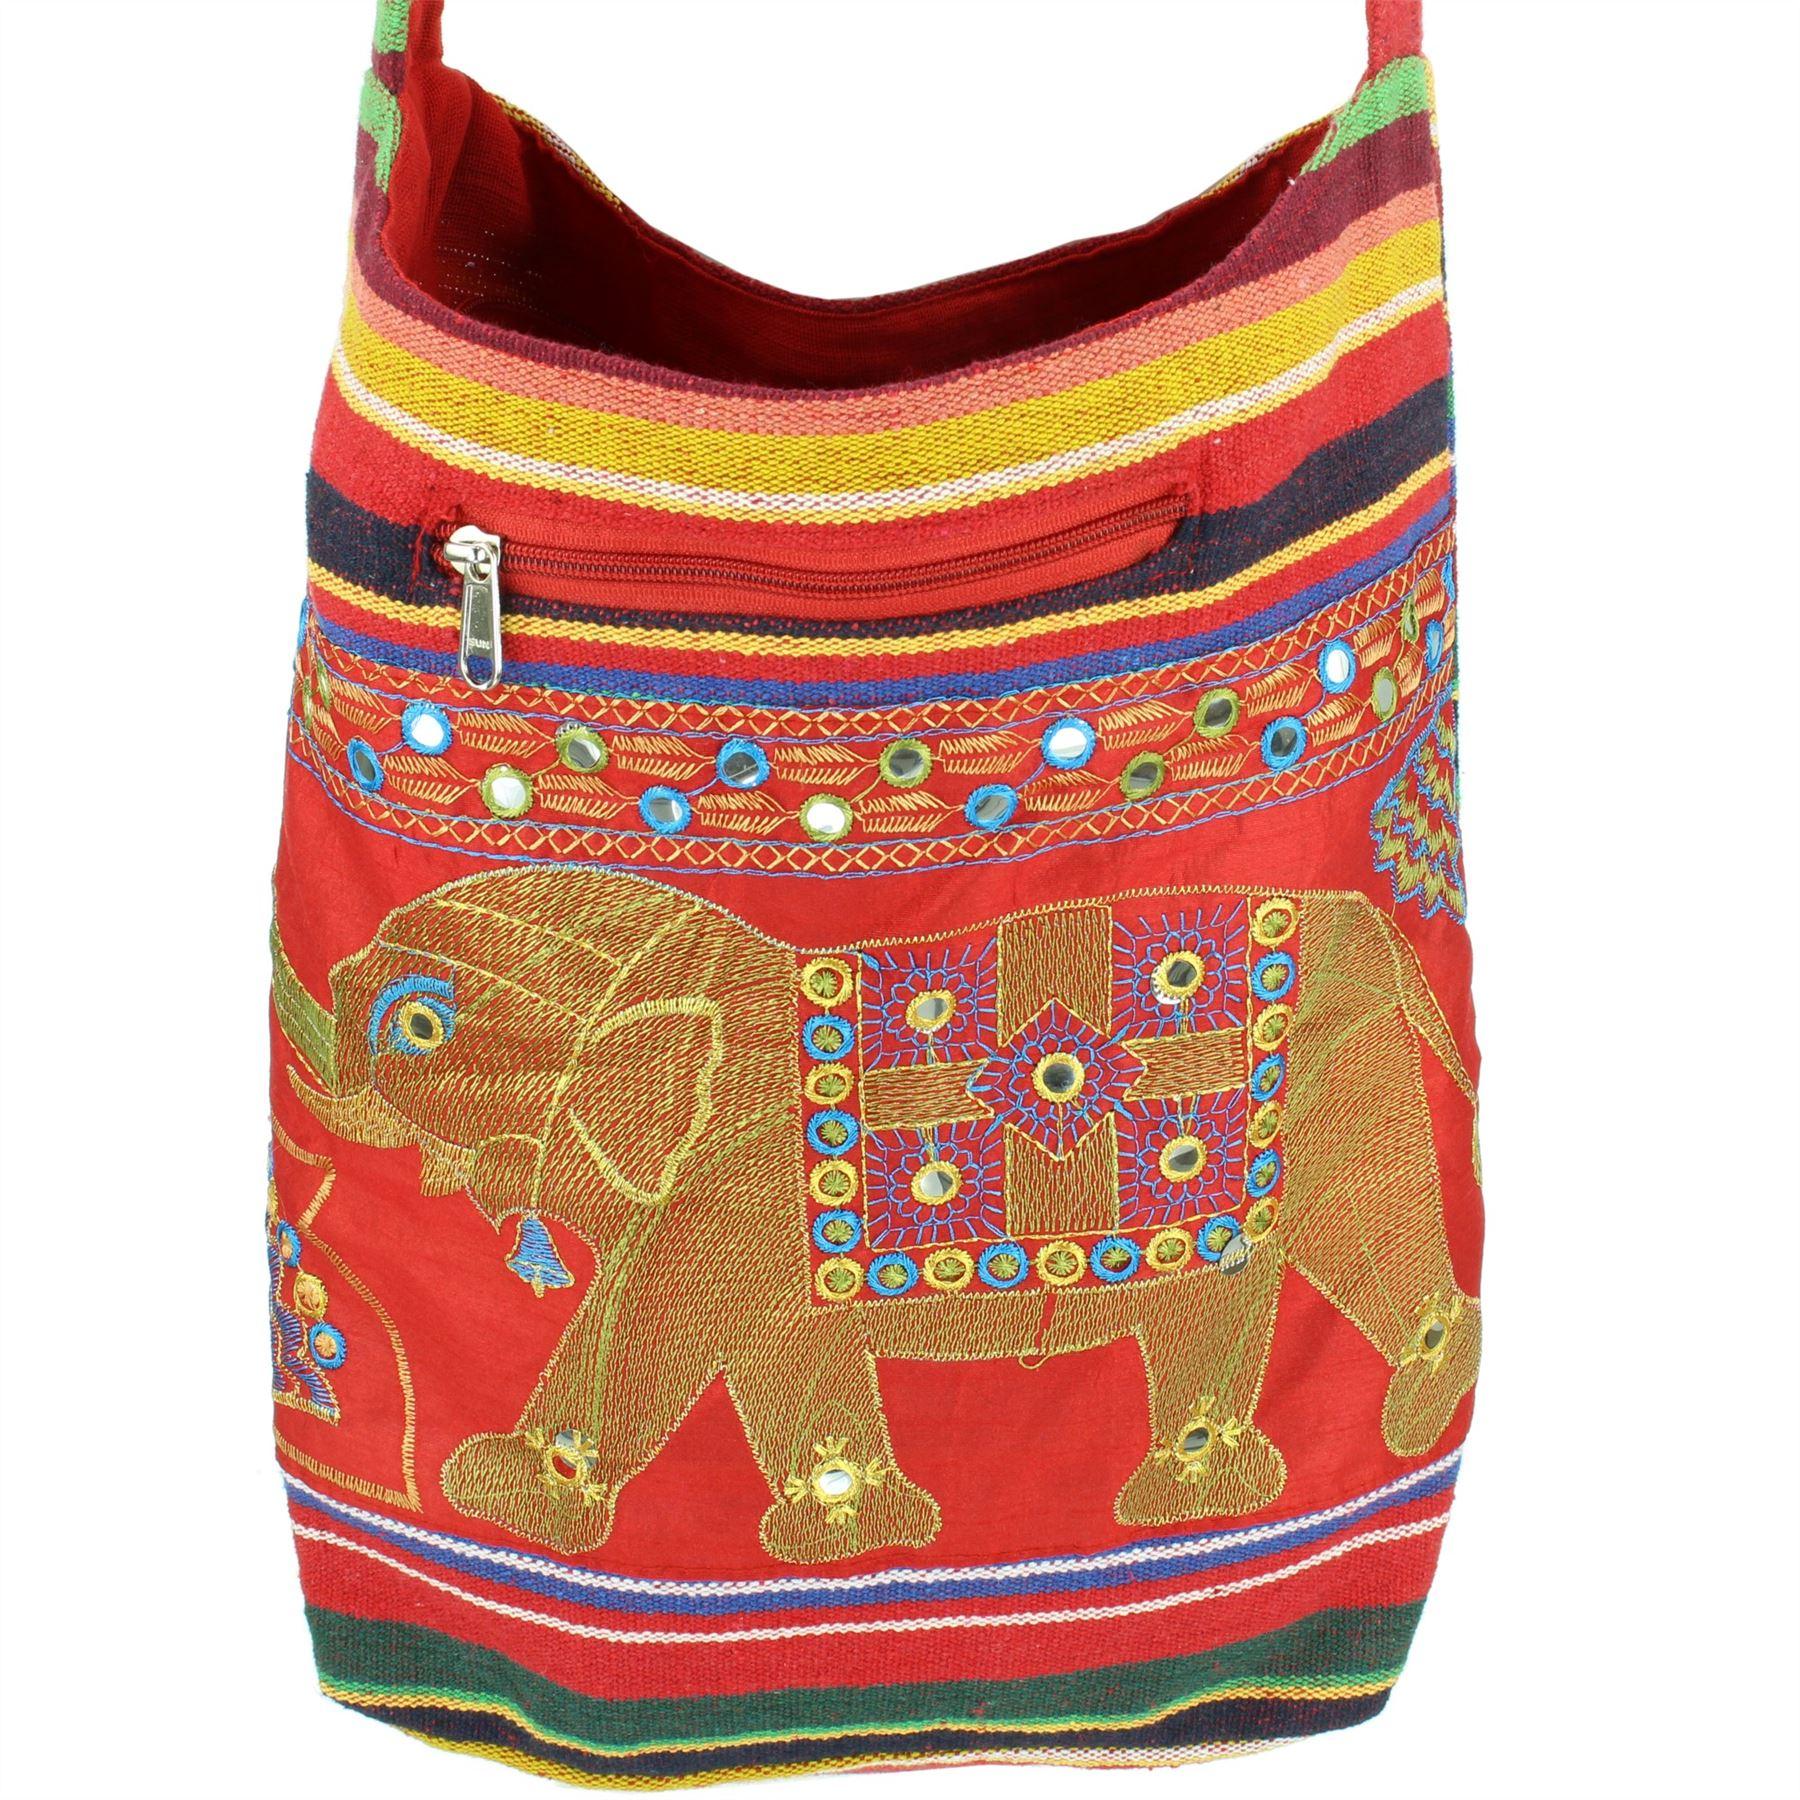 Sling-Bag-Elephant-Messenger-Crossbody-Cross-Body-Handbag-Backpack-Hippie-Hobo miniatuur 20